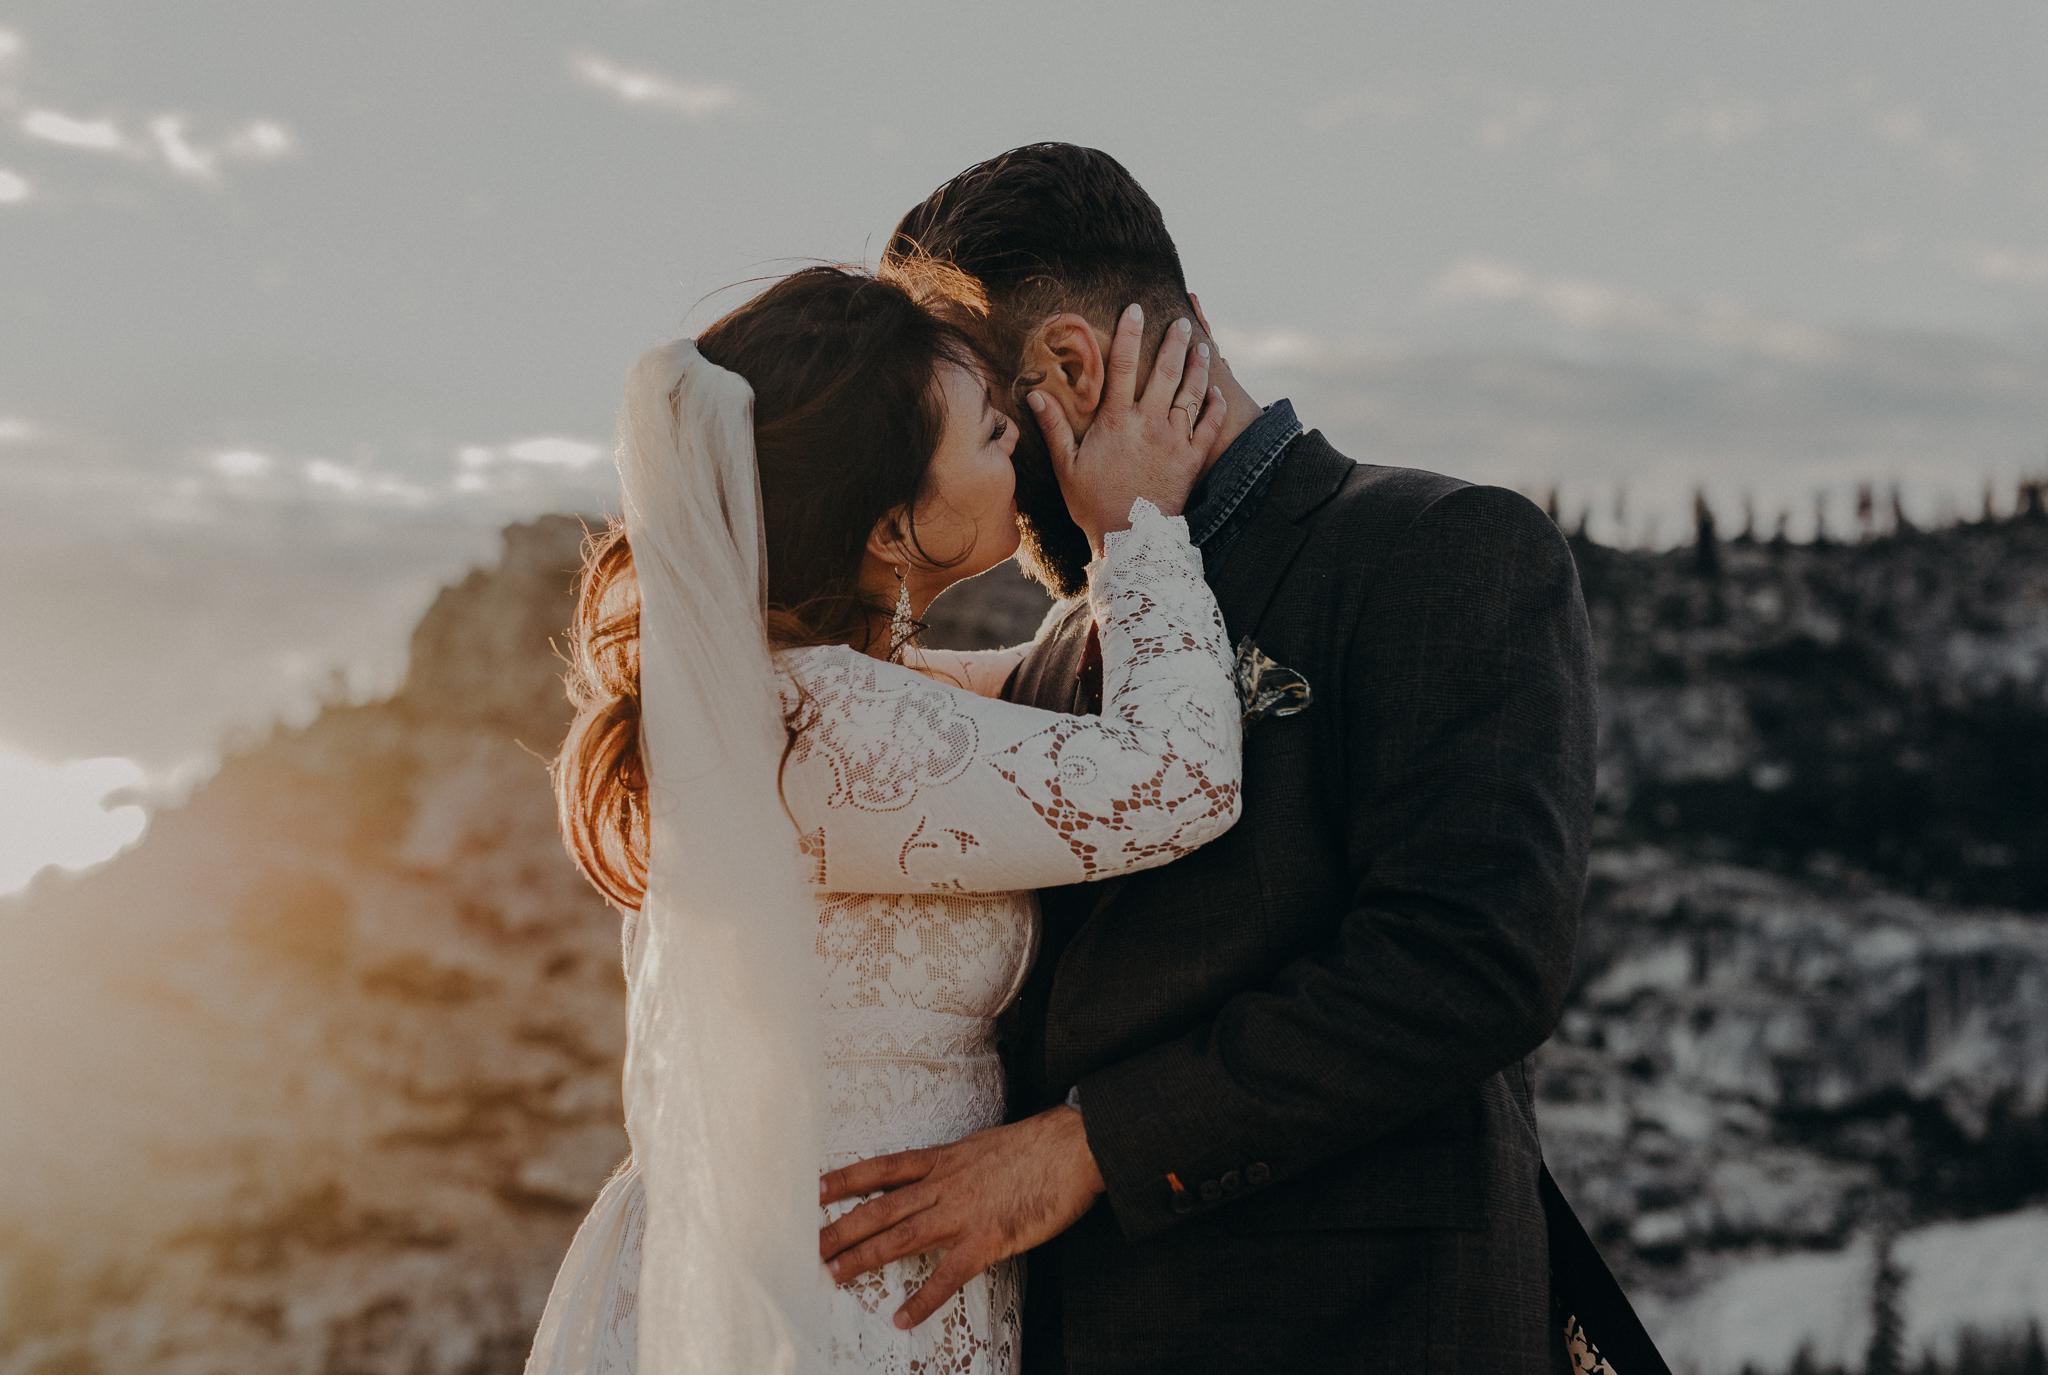 Yosemite Elopement Photographer - Evergreen Lodge Wedding Photographer - wedding photographer in los angeles